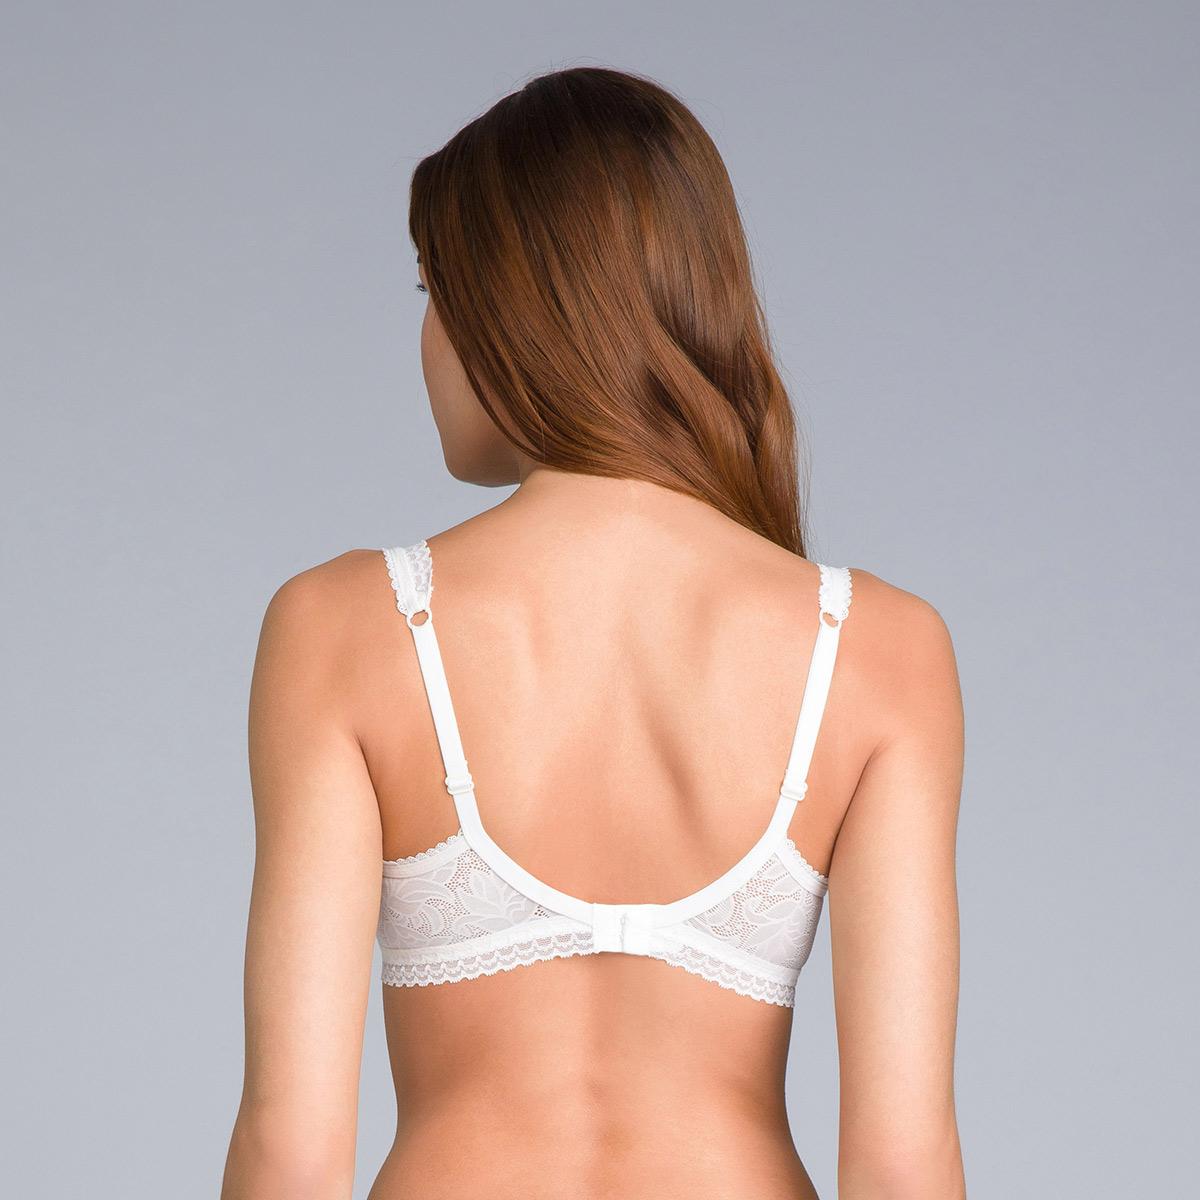 Soutien-gorge invisible balconnet blanc ivoire - Invisible Elegance, , PLAYTEX